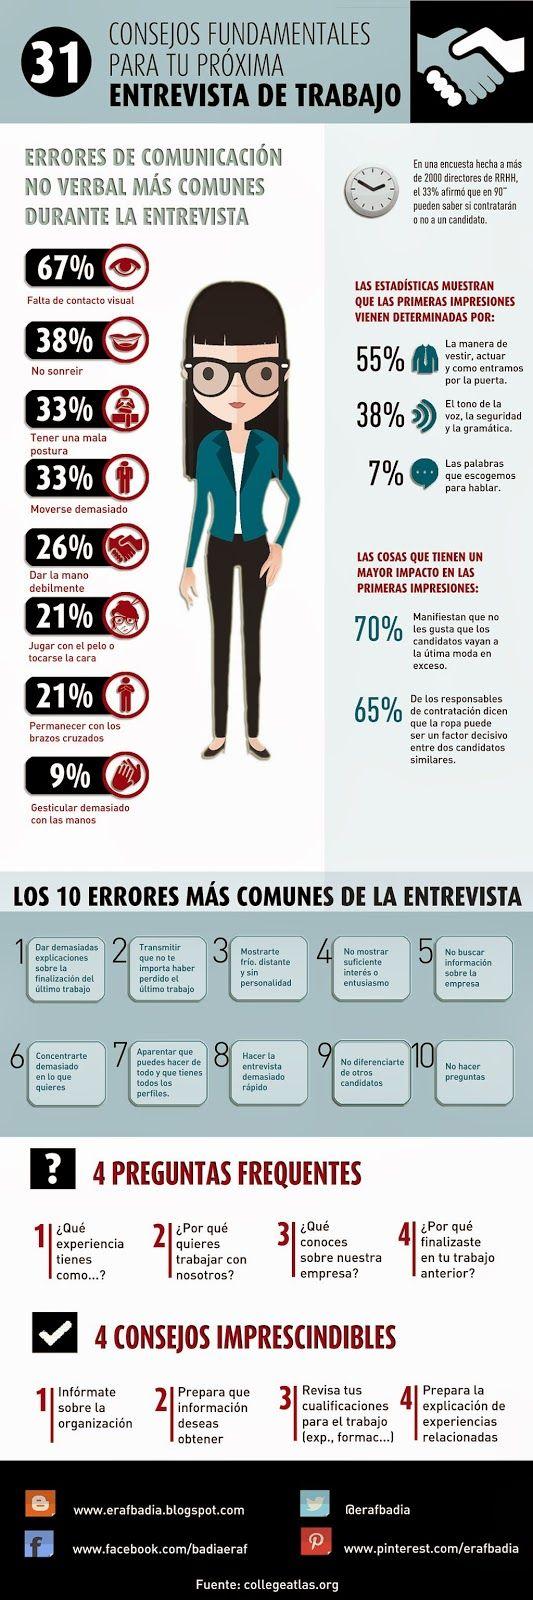 31 consejos para tu próxima entrevista de trabajo. Infografía. ~ ESPAI DE RECERCA ACTIVA DE FEINA: